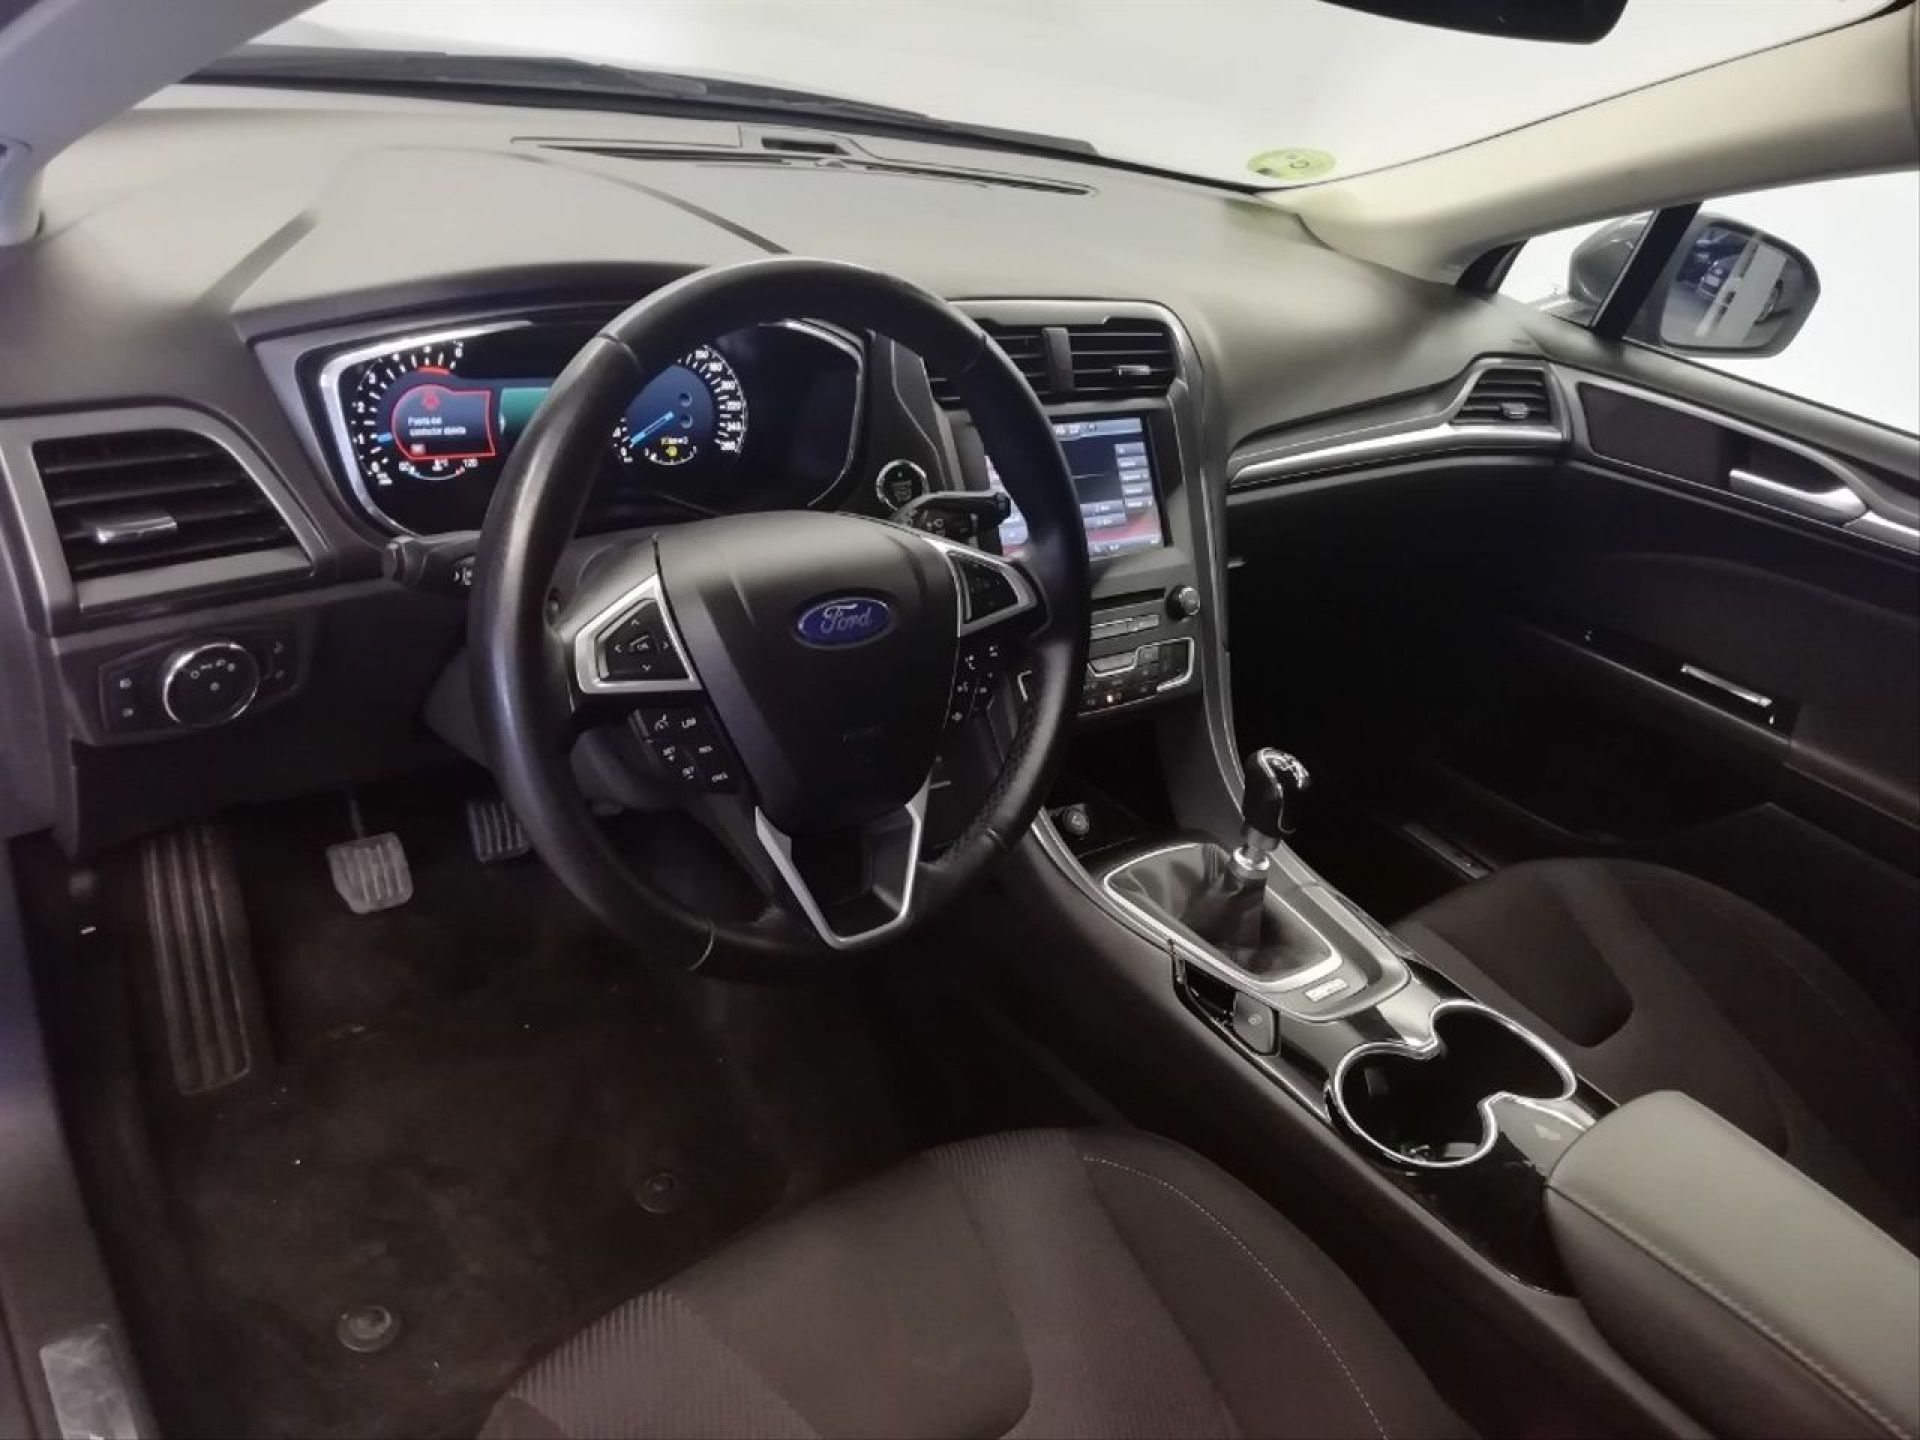 Ford Mondeo 2.0 TDCi 150CV AWD Titanium